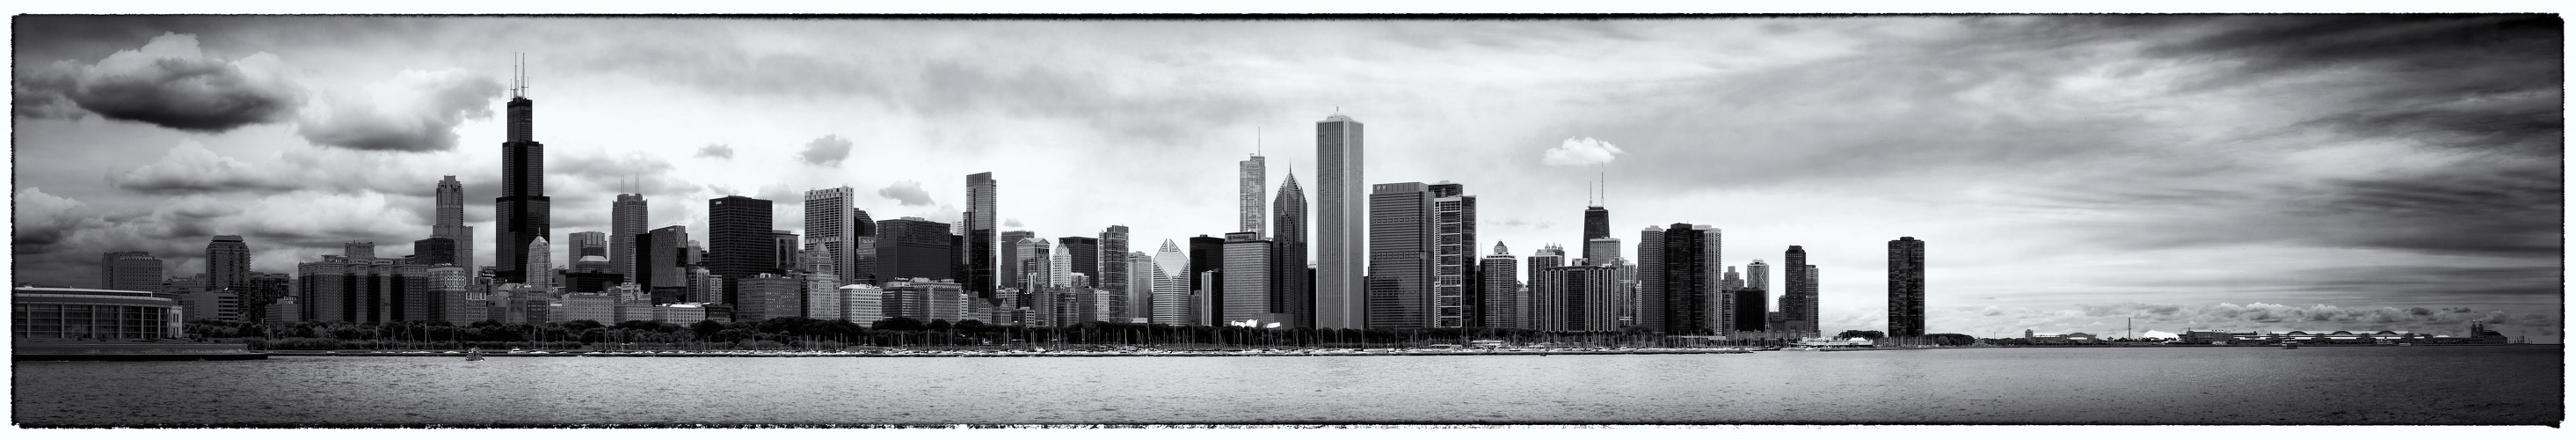 Chicago's New Skyline